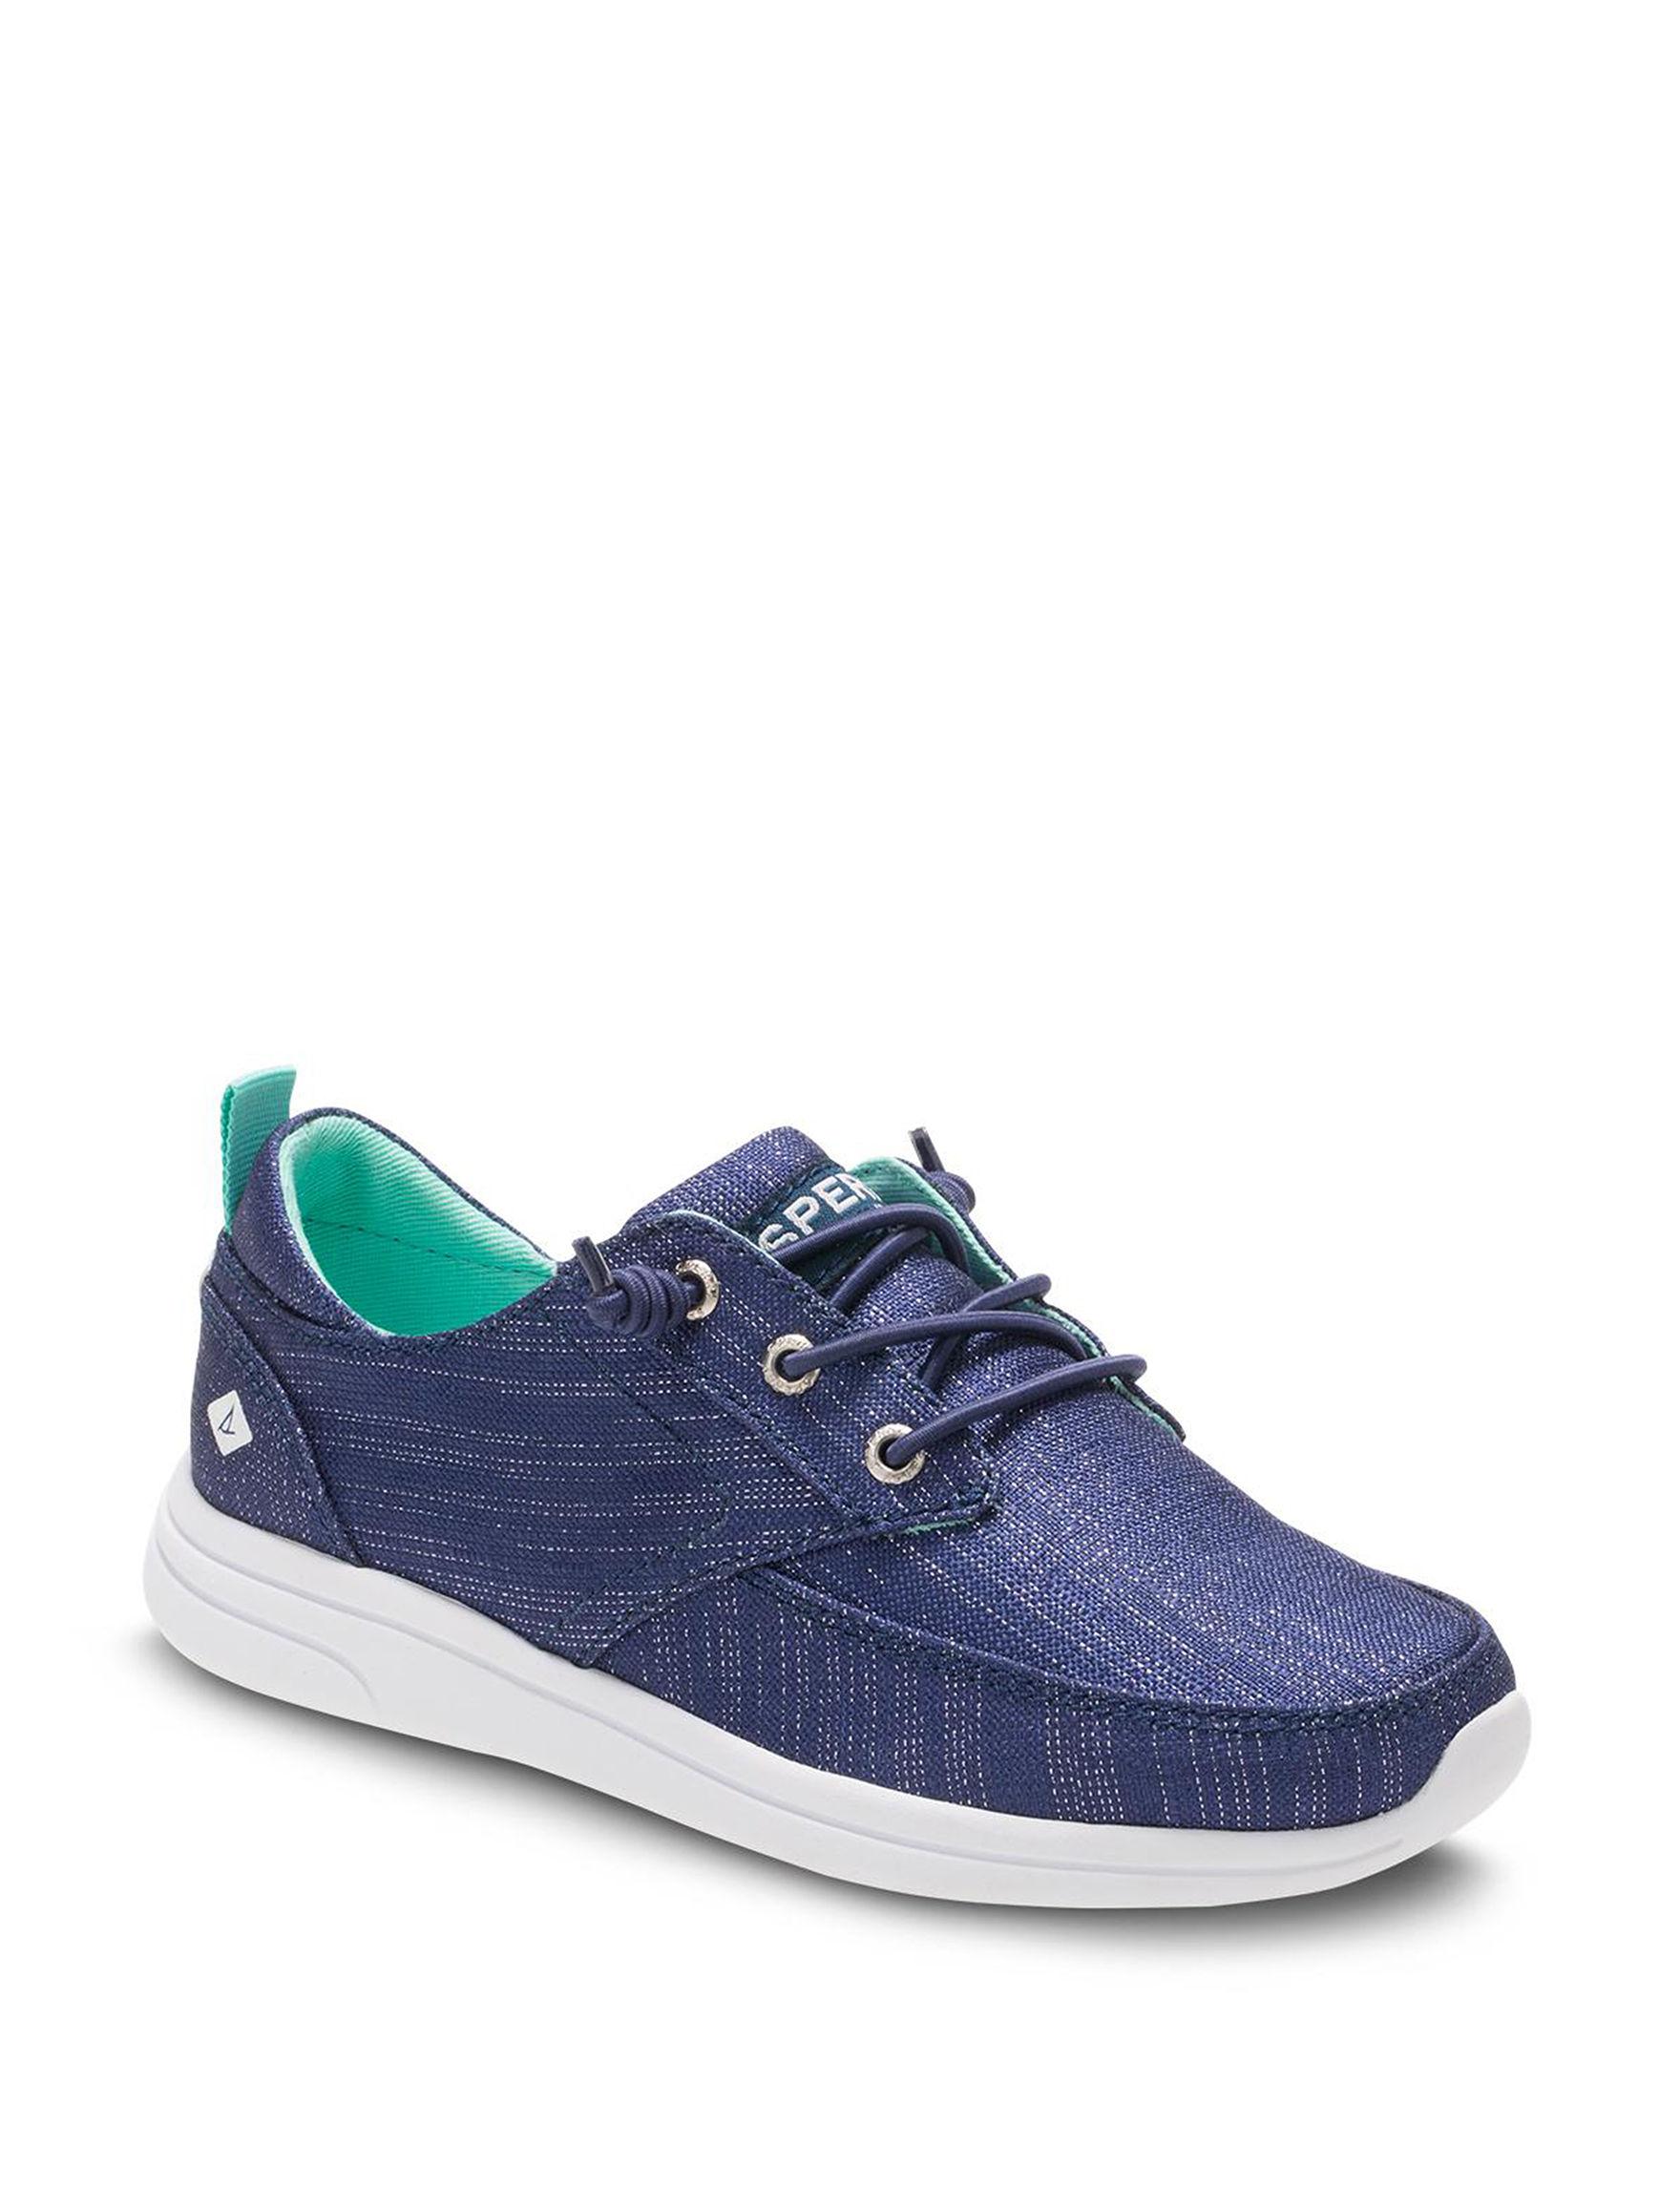 Sperry Blue